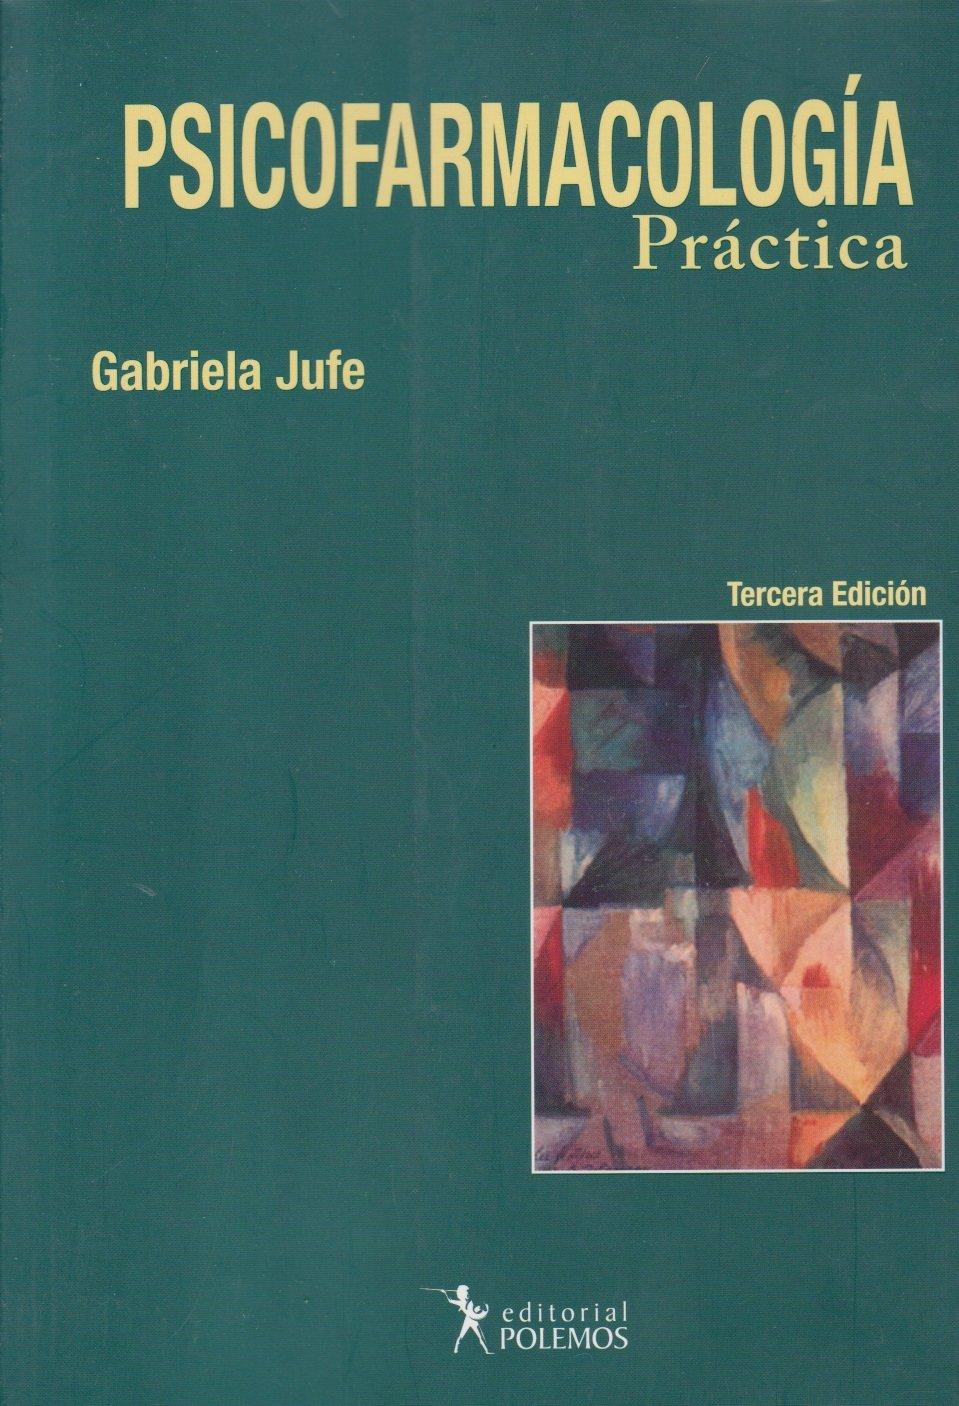 Psicofarmacologia Practica ebook